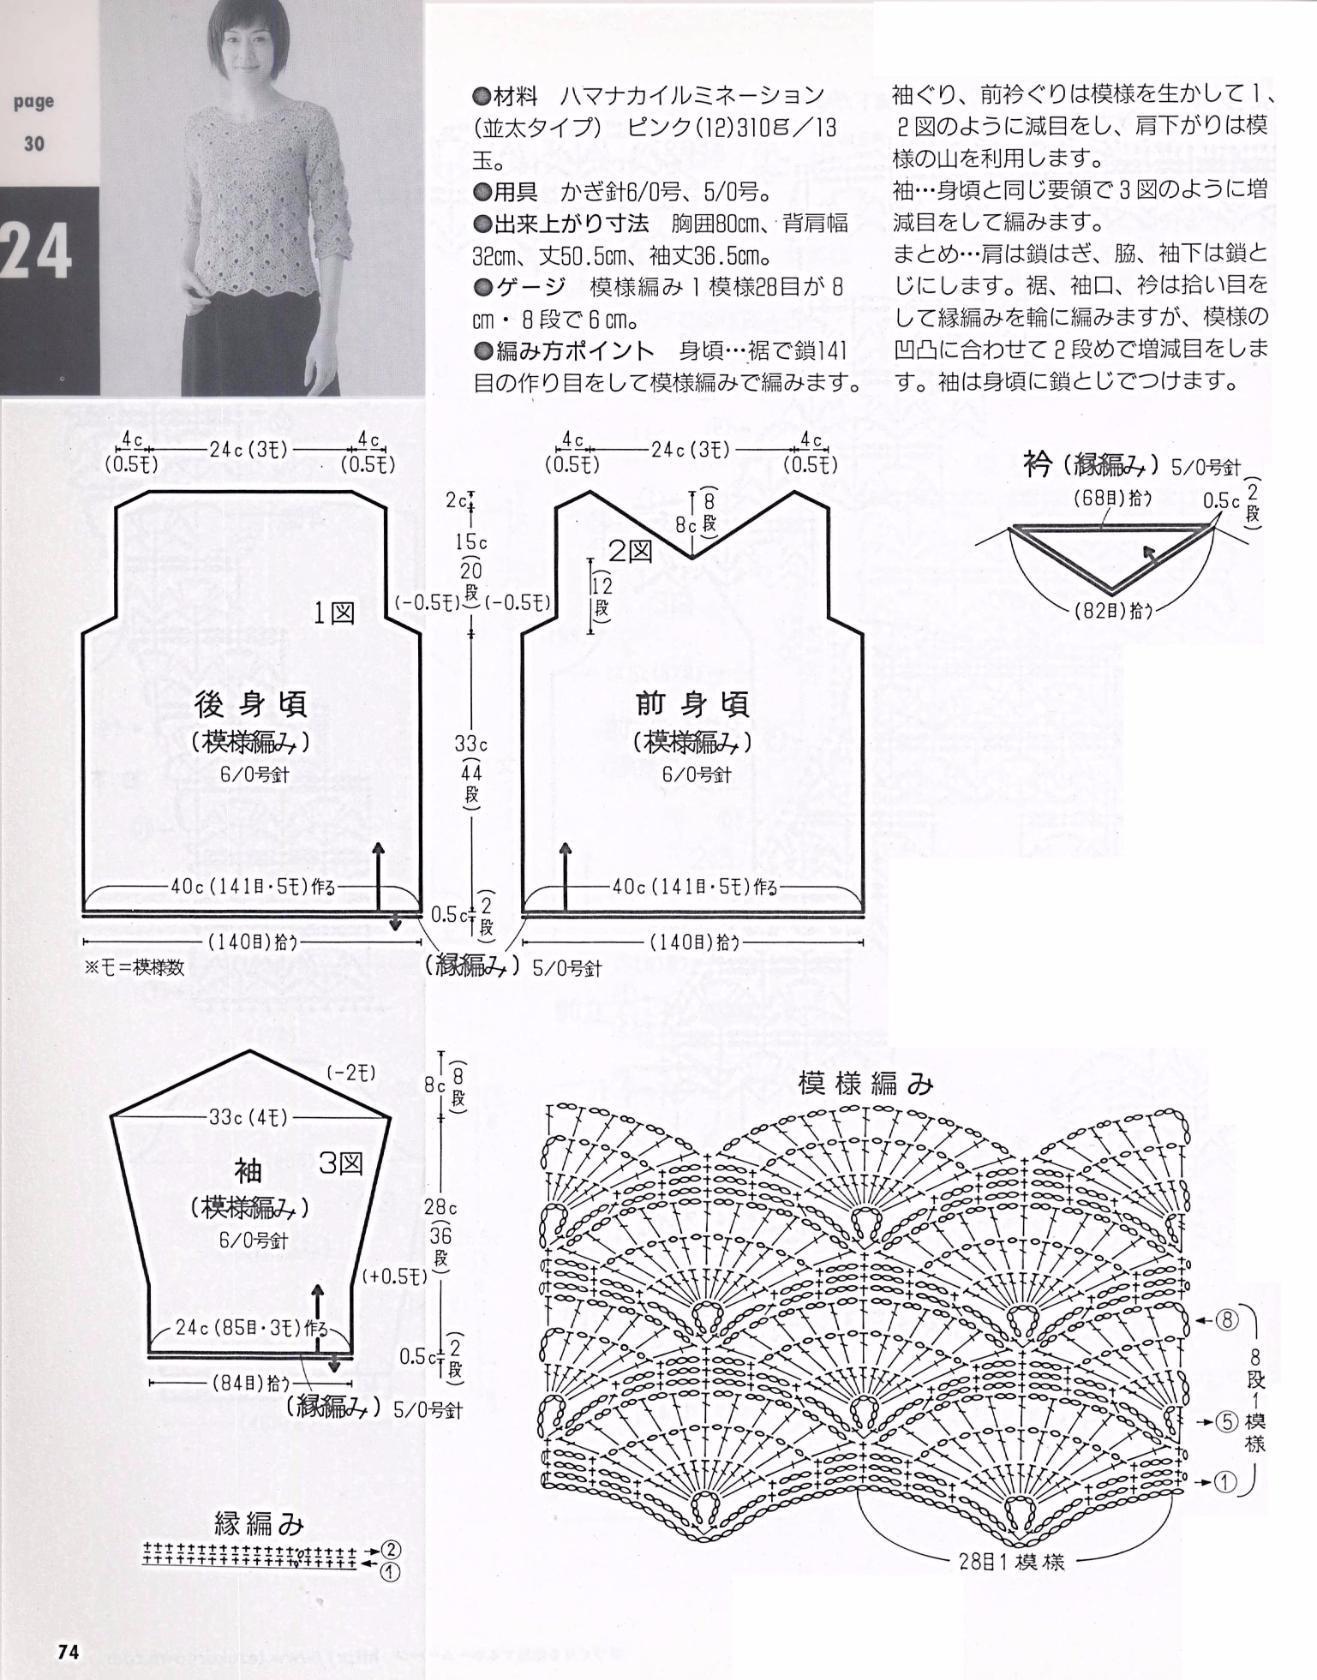 Blusa a crochet con esquemas media manga2